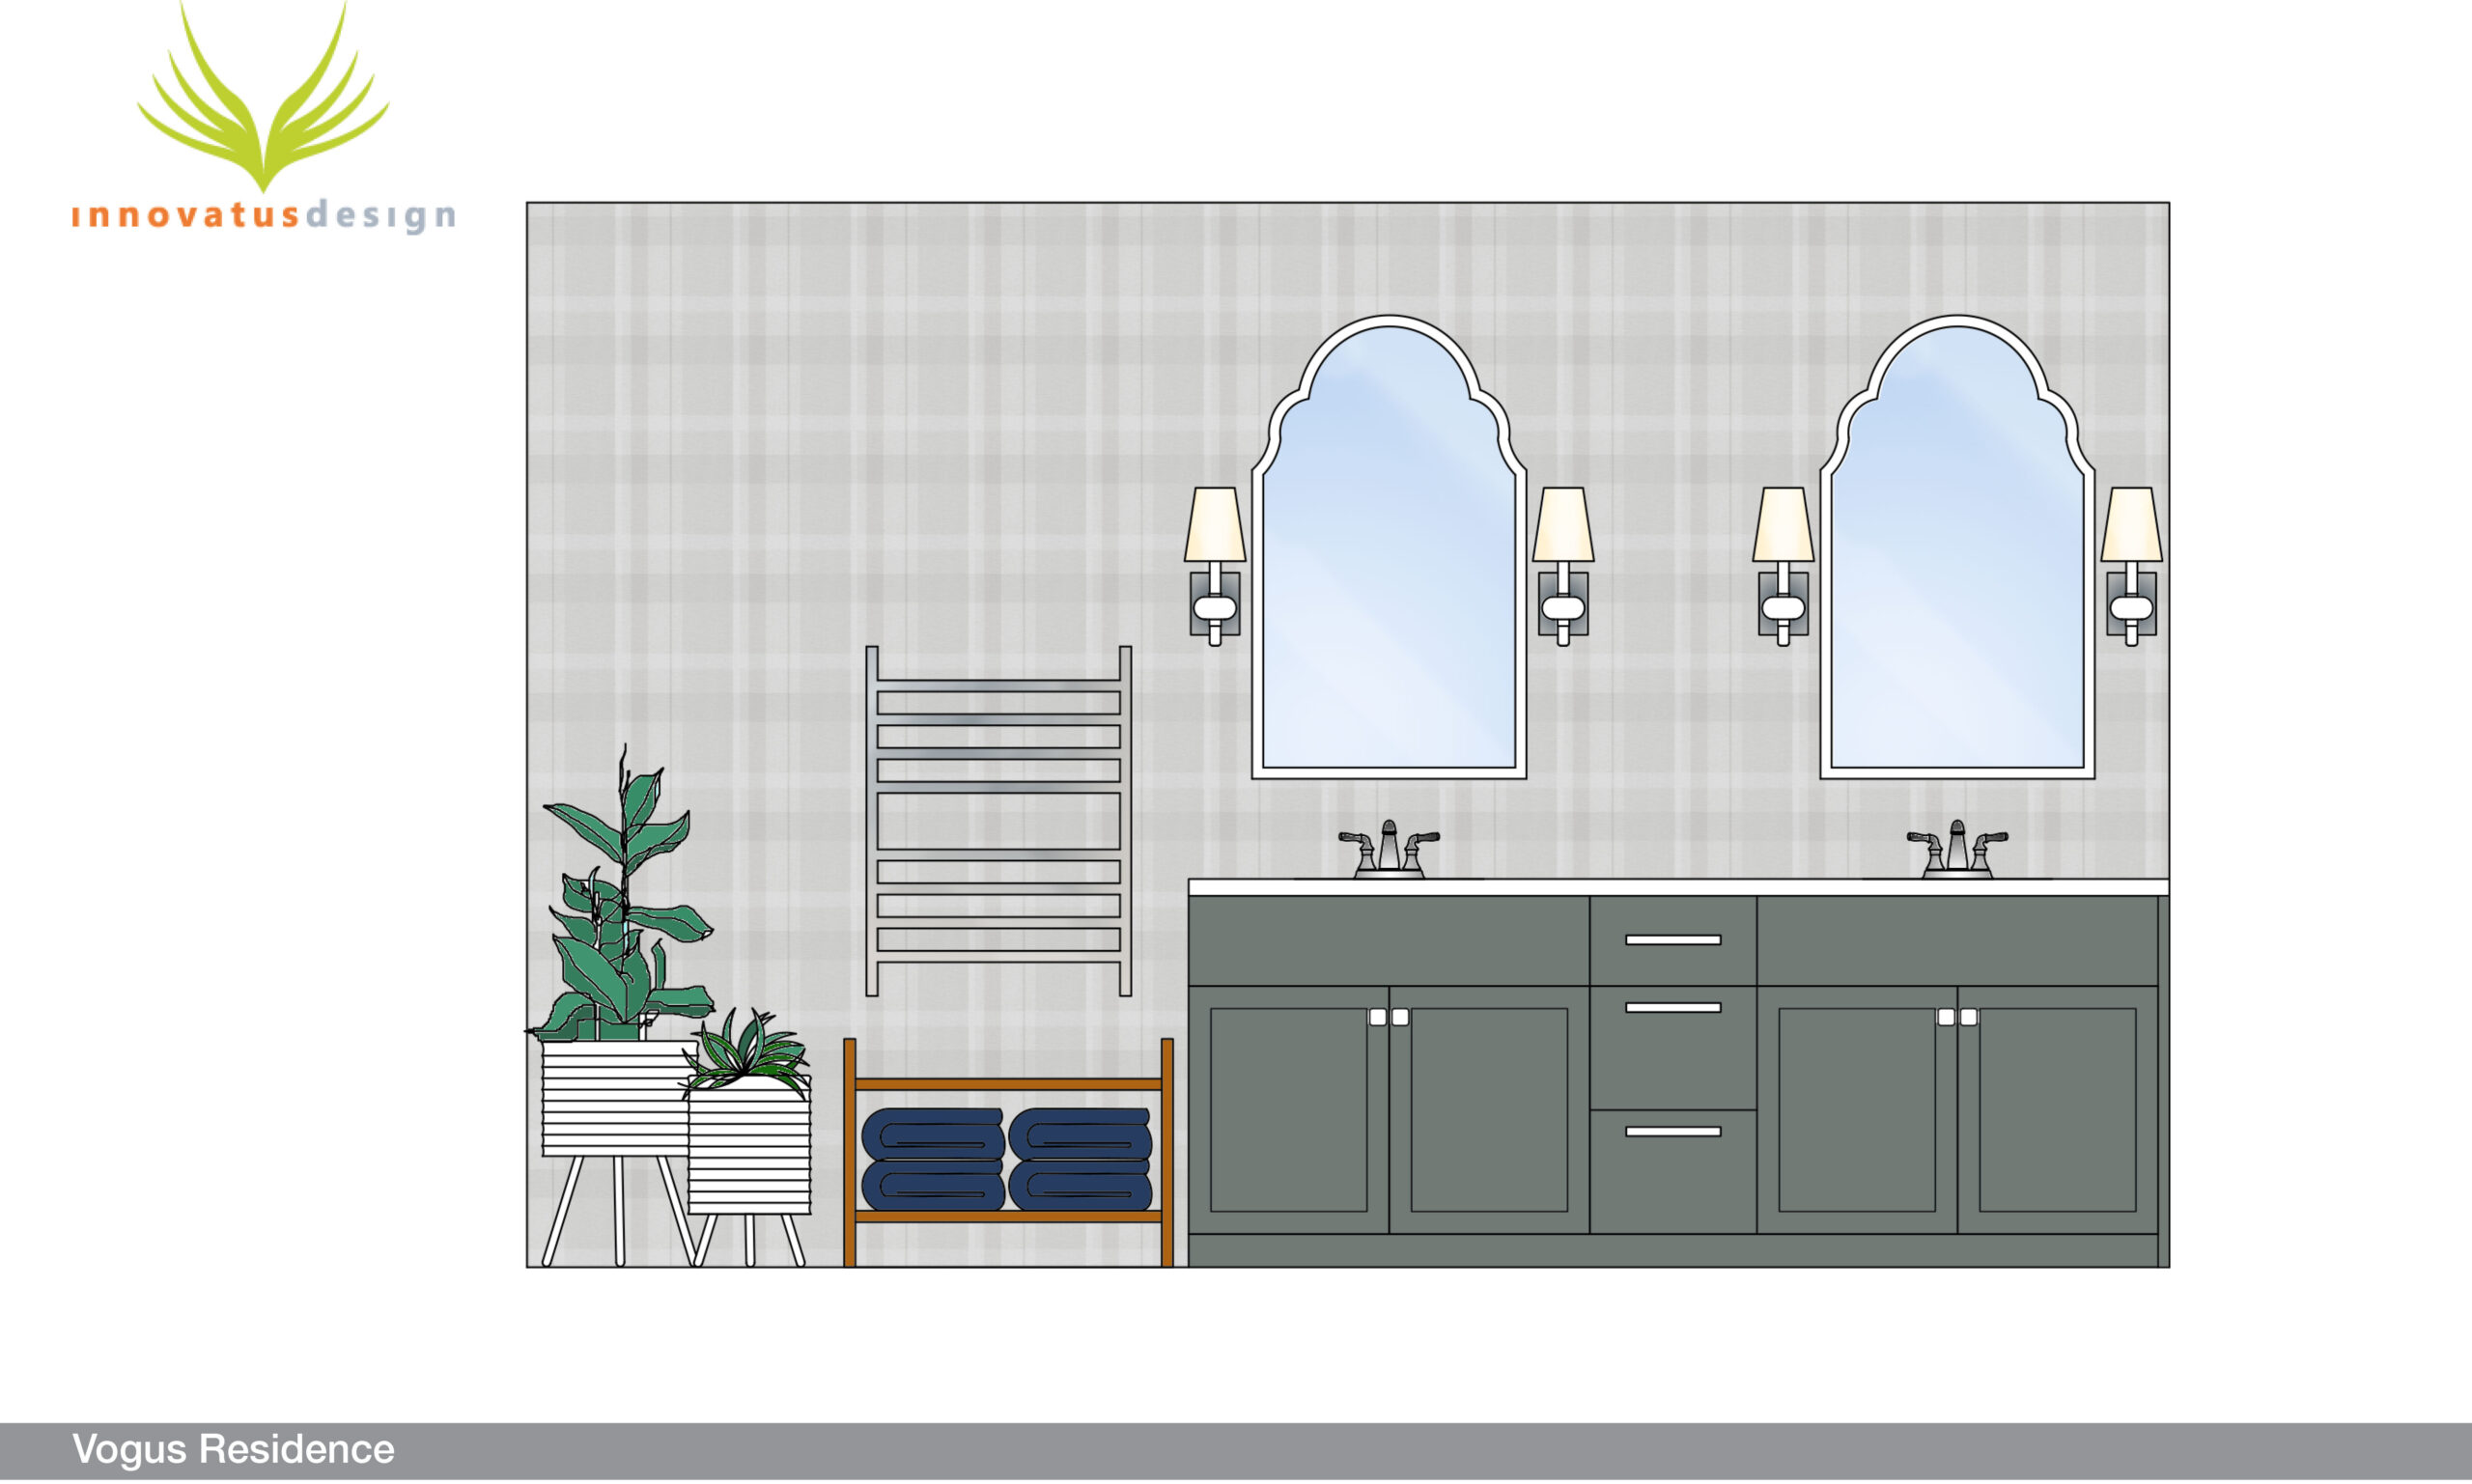 Childrens' Furniture Floor Plan